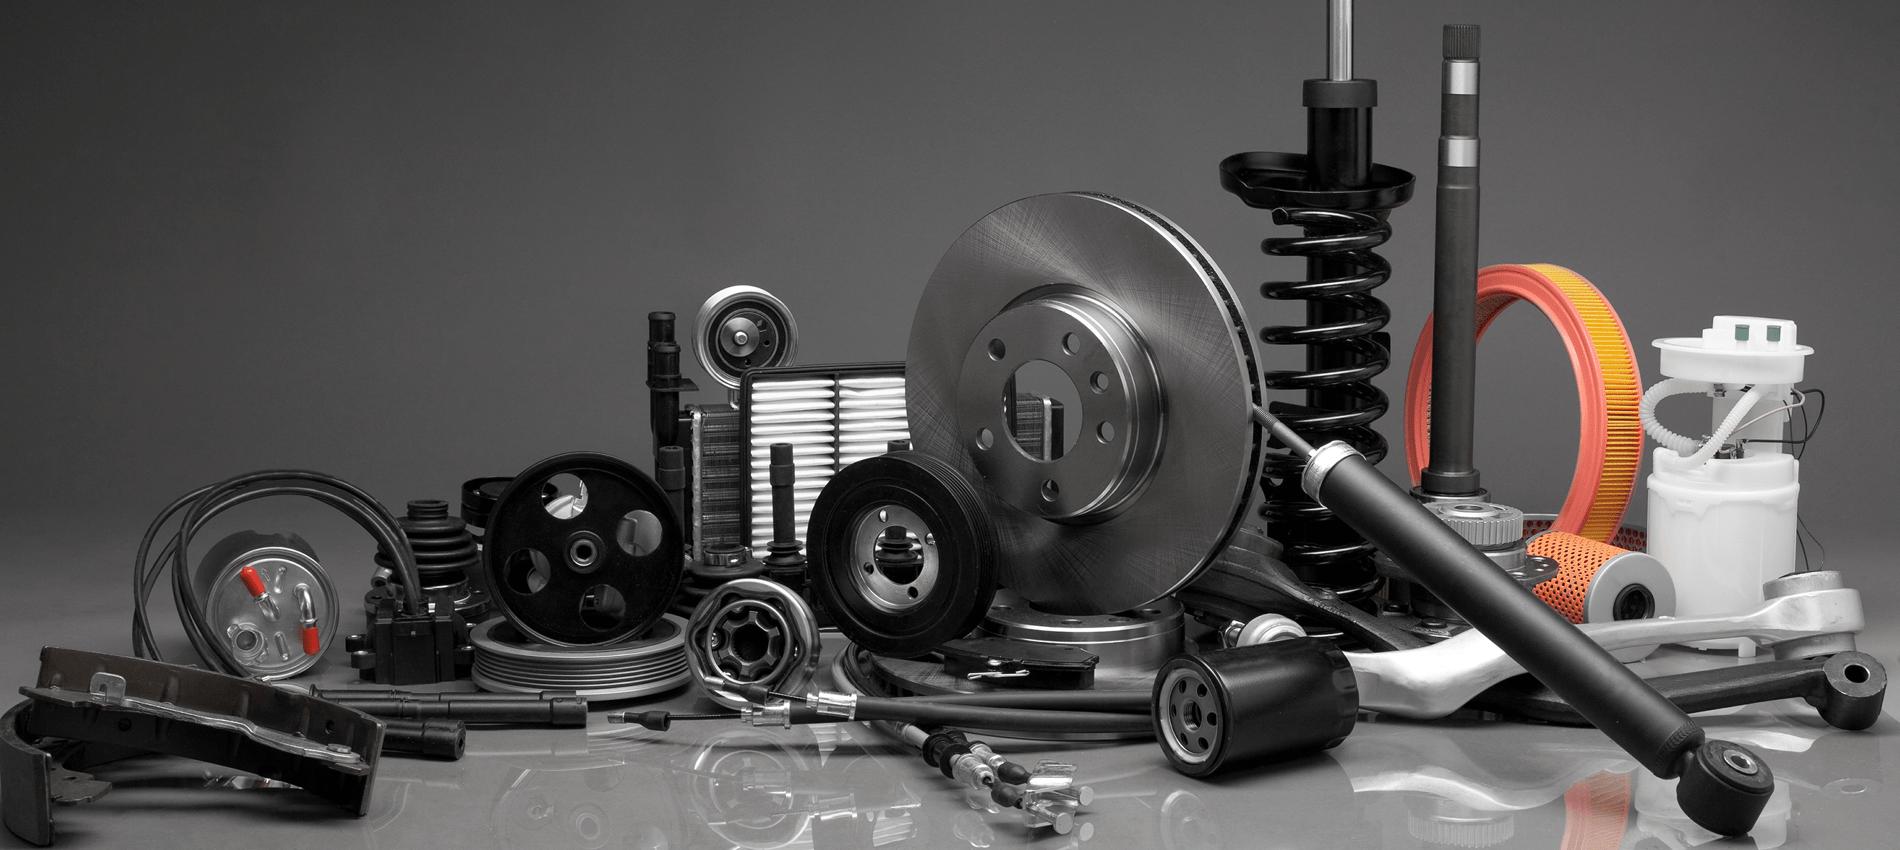 auto parts on table